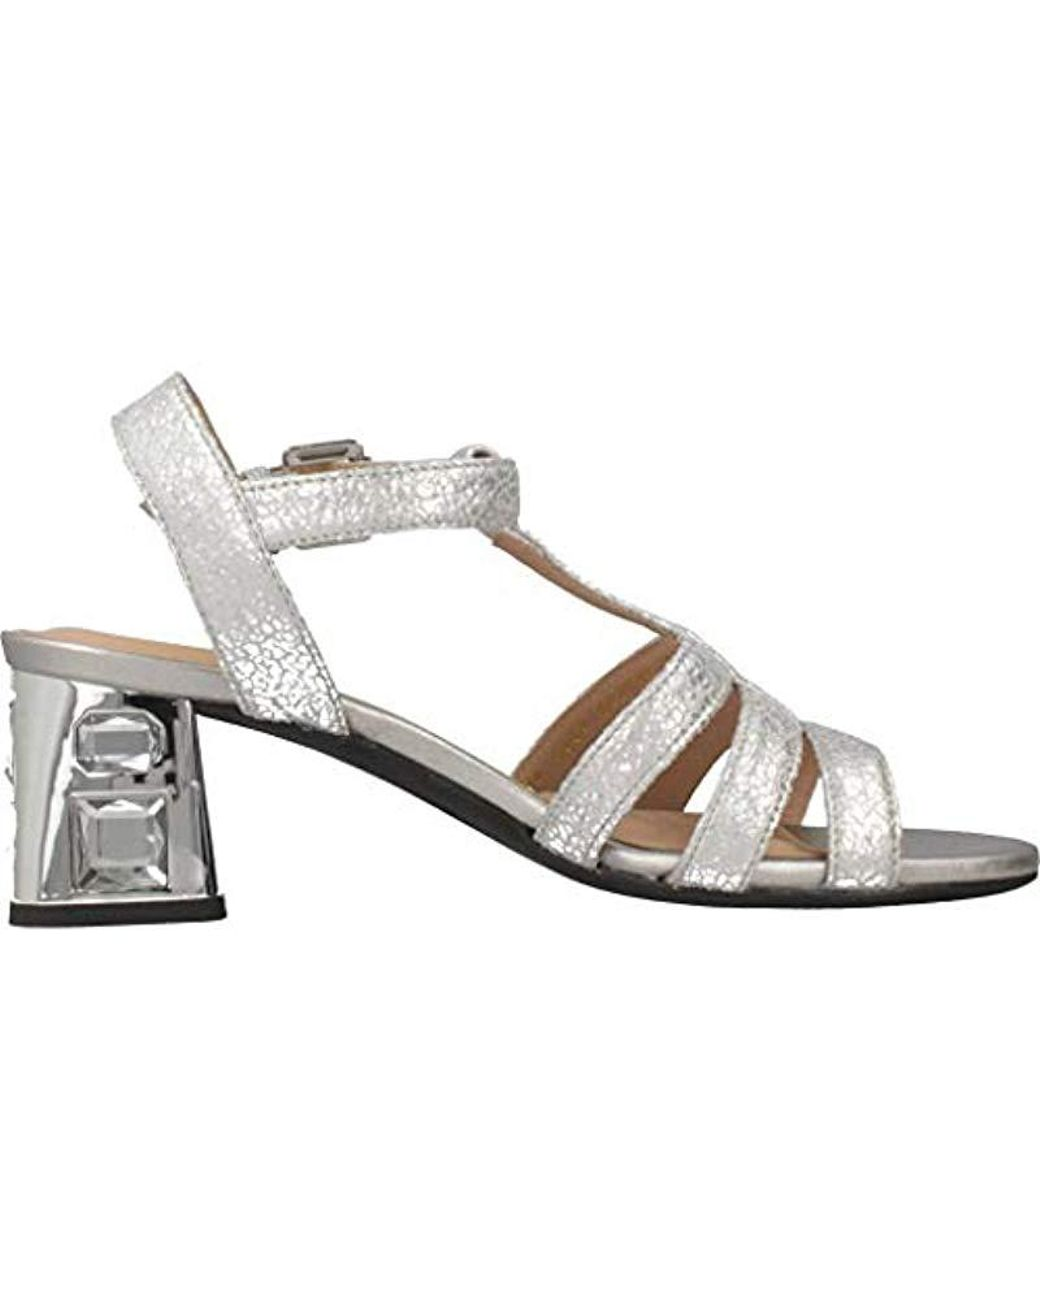 Seyla High Plus Ou Sandal D Geox ABout lcJFTK13